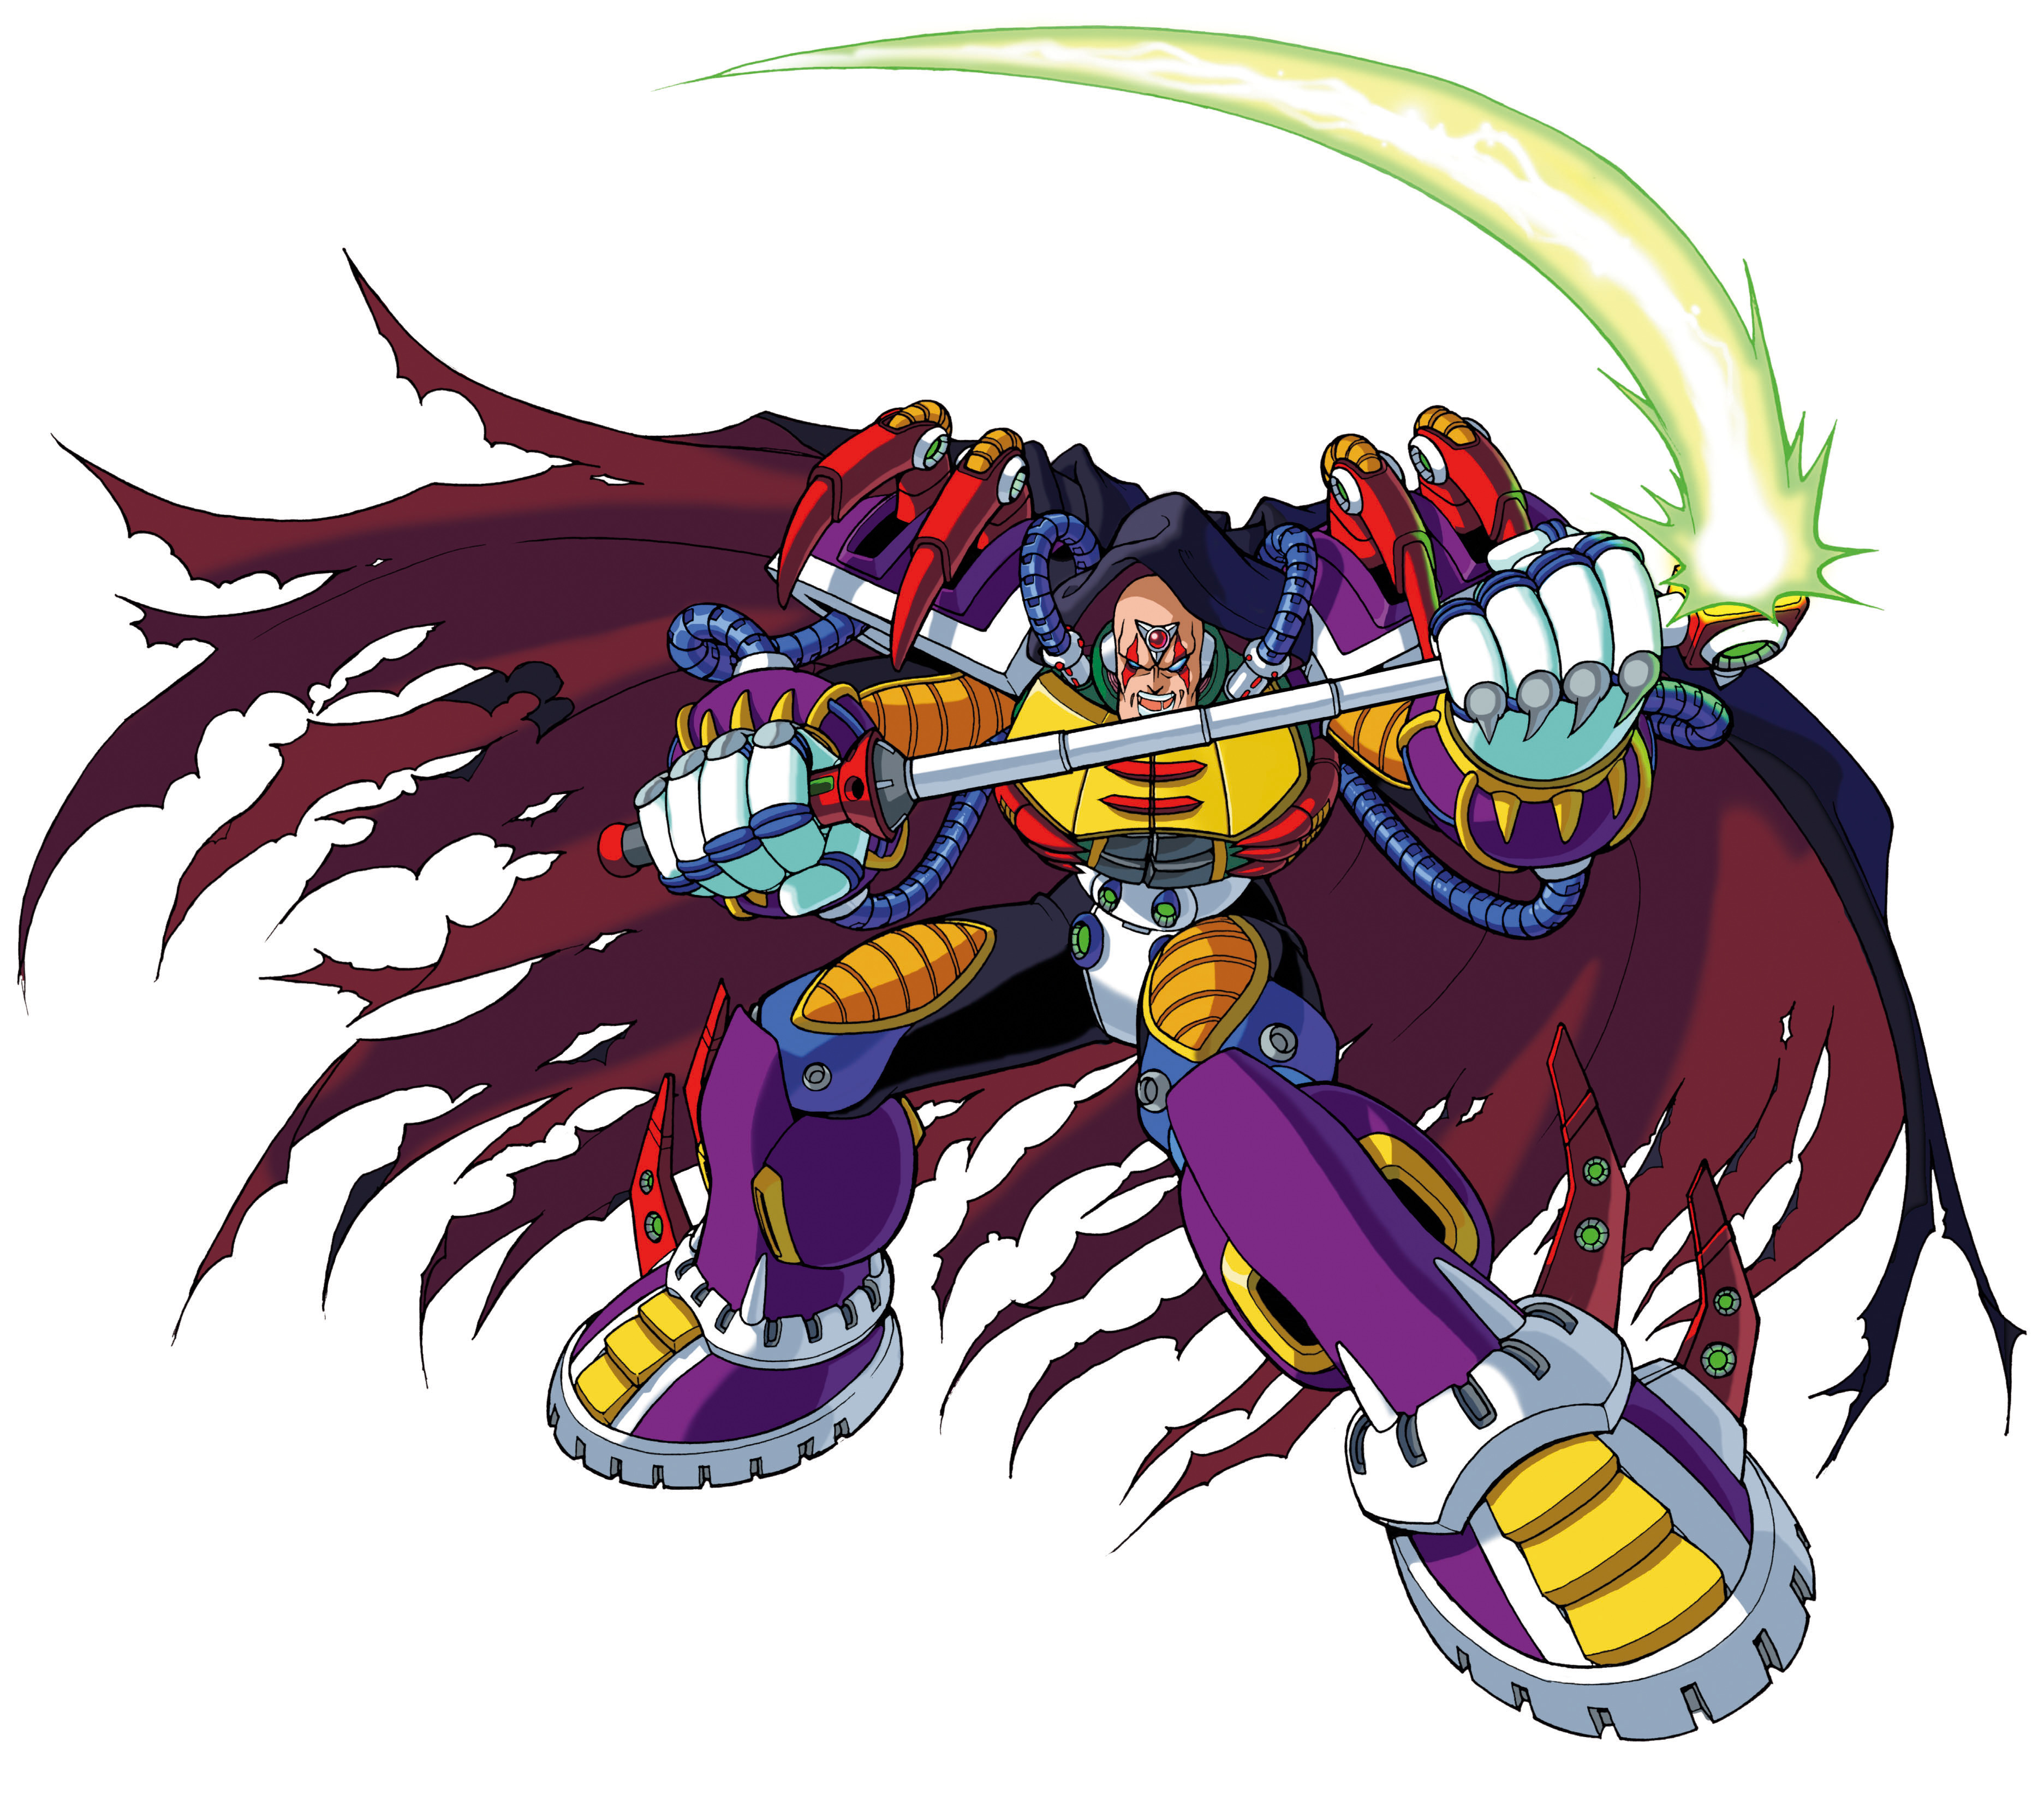 Megaman X4 Order Zero Zeros Bosses Bosses Guide Mega Man X4